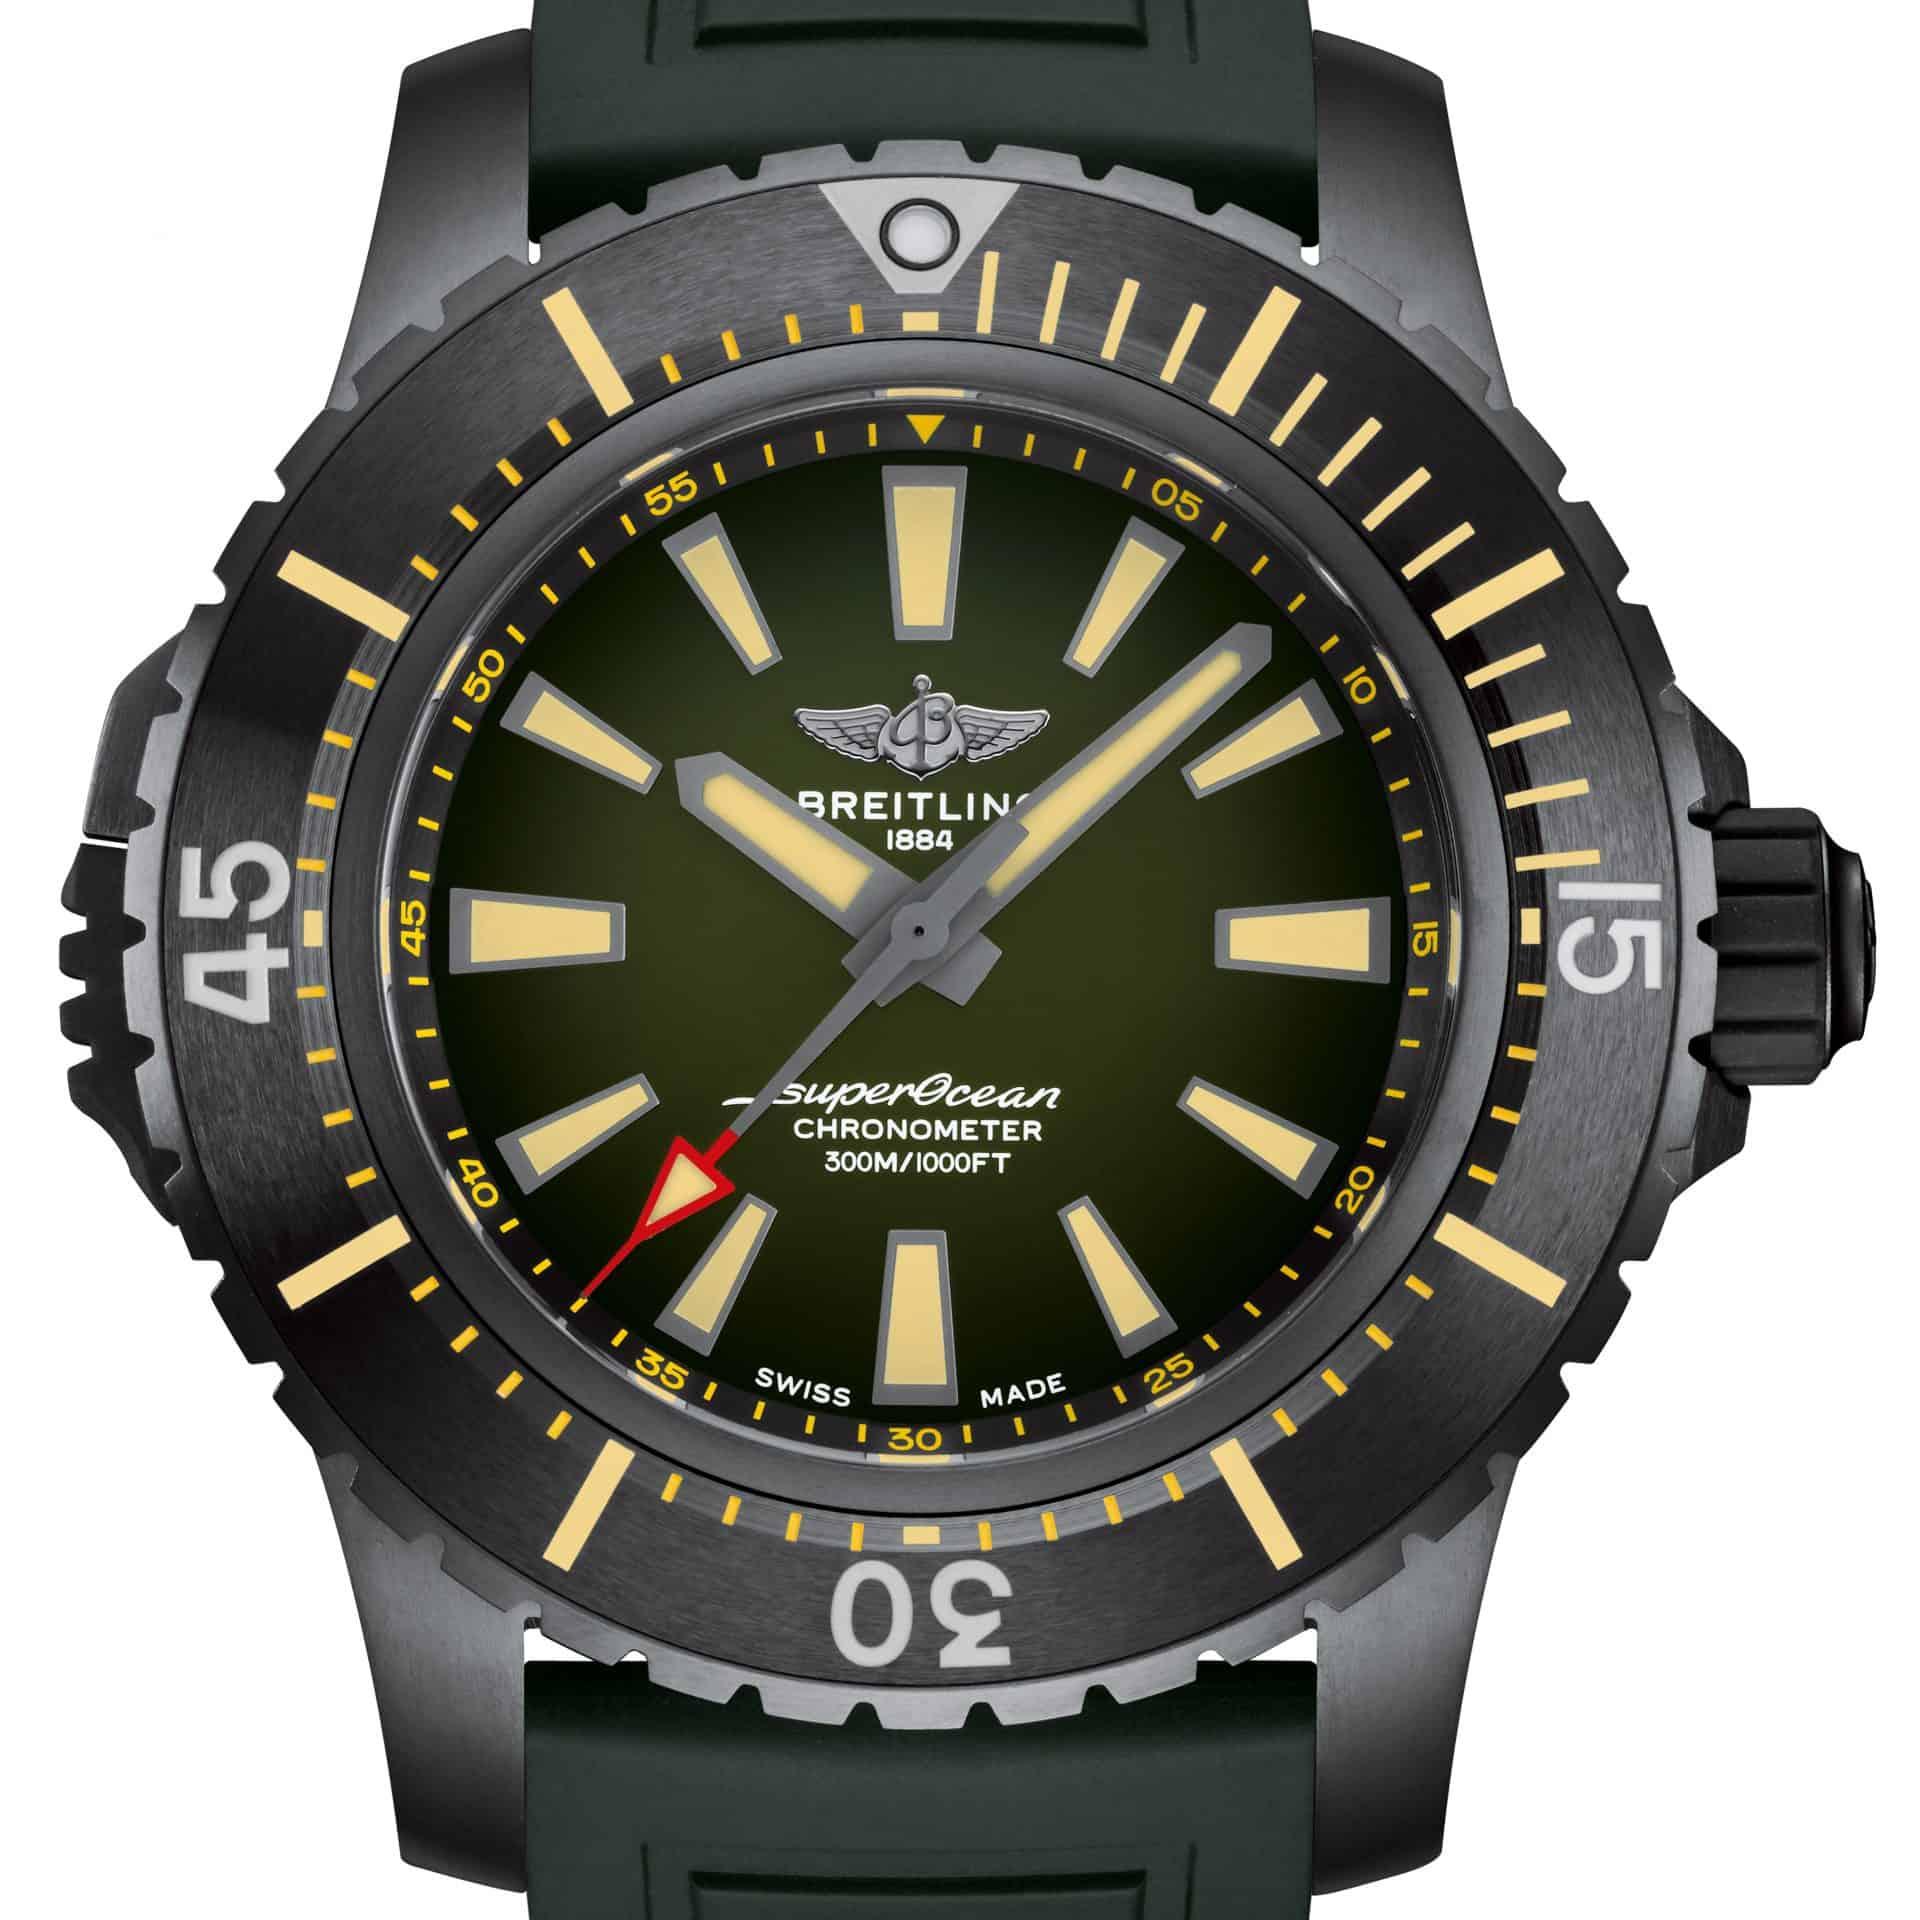 Breitling Superocean Automatic 48 Boutique Edition GPHG 2020